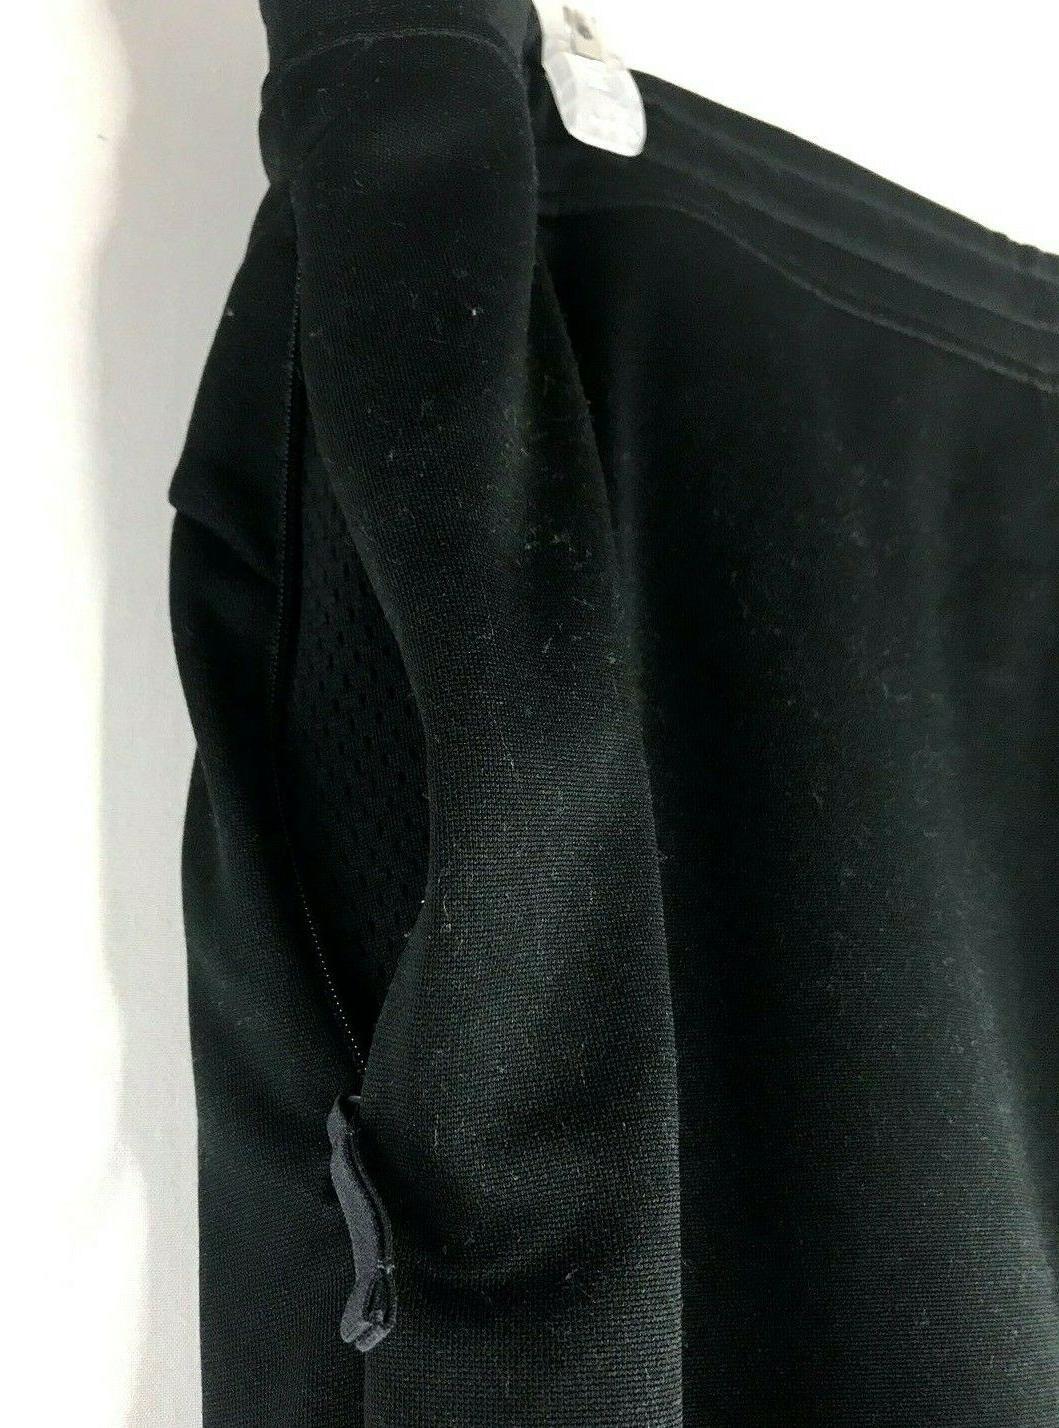 NWT Mens Under Armour Sweatpants Joggers Gear Black Size